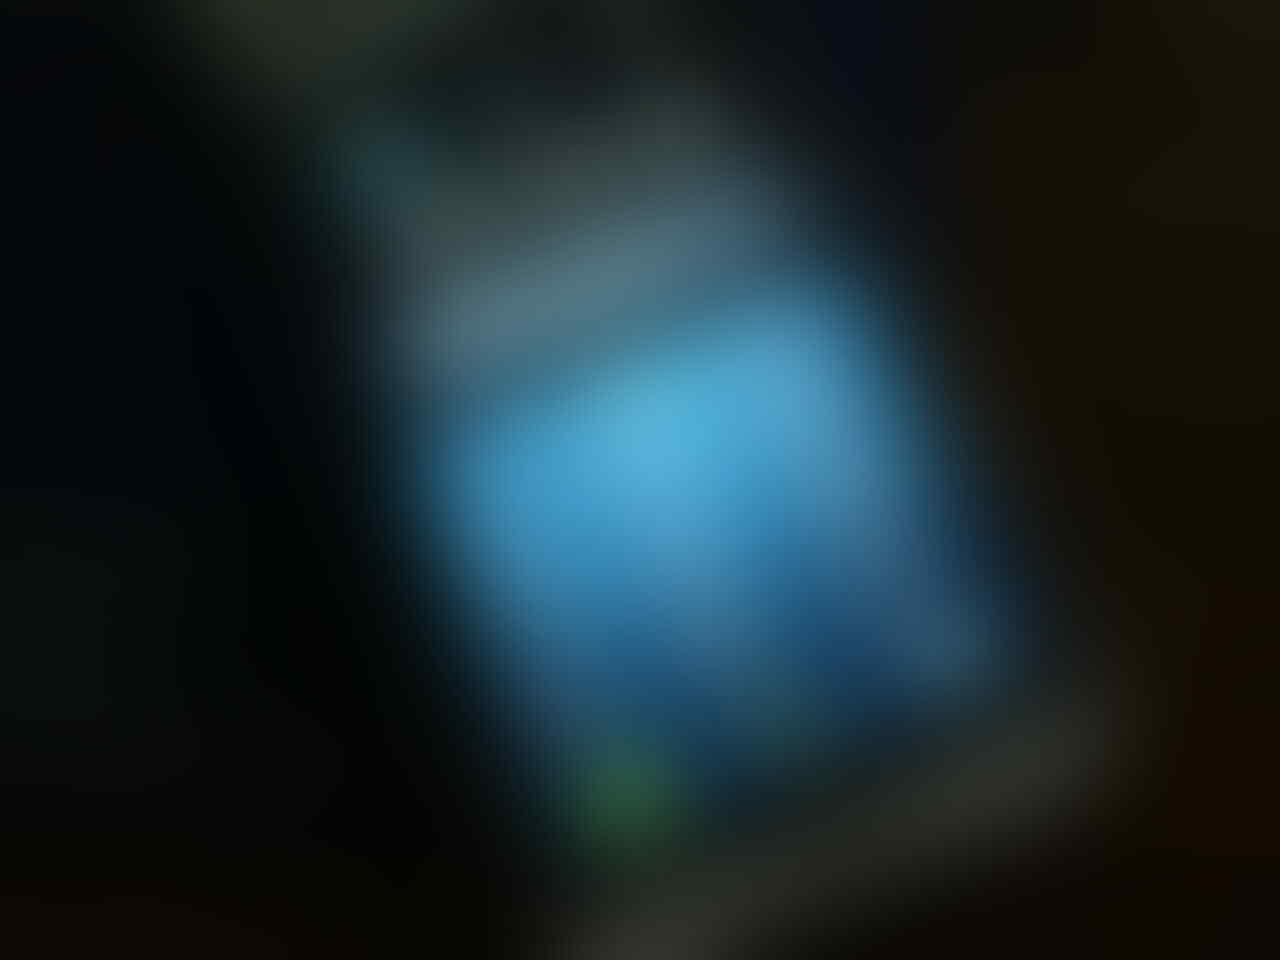 Replika Samsung Galaxy S4 Interface 1:1